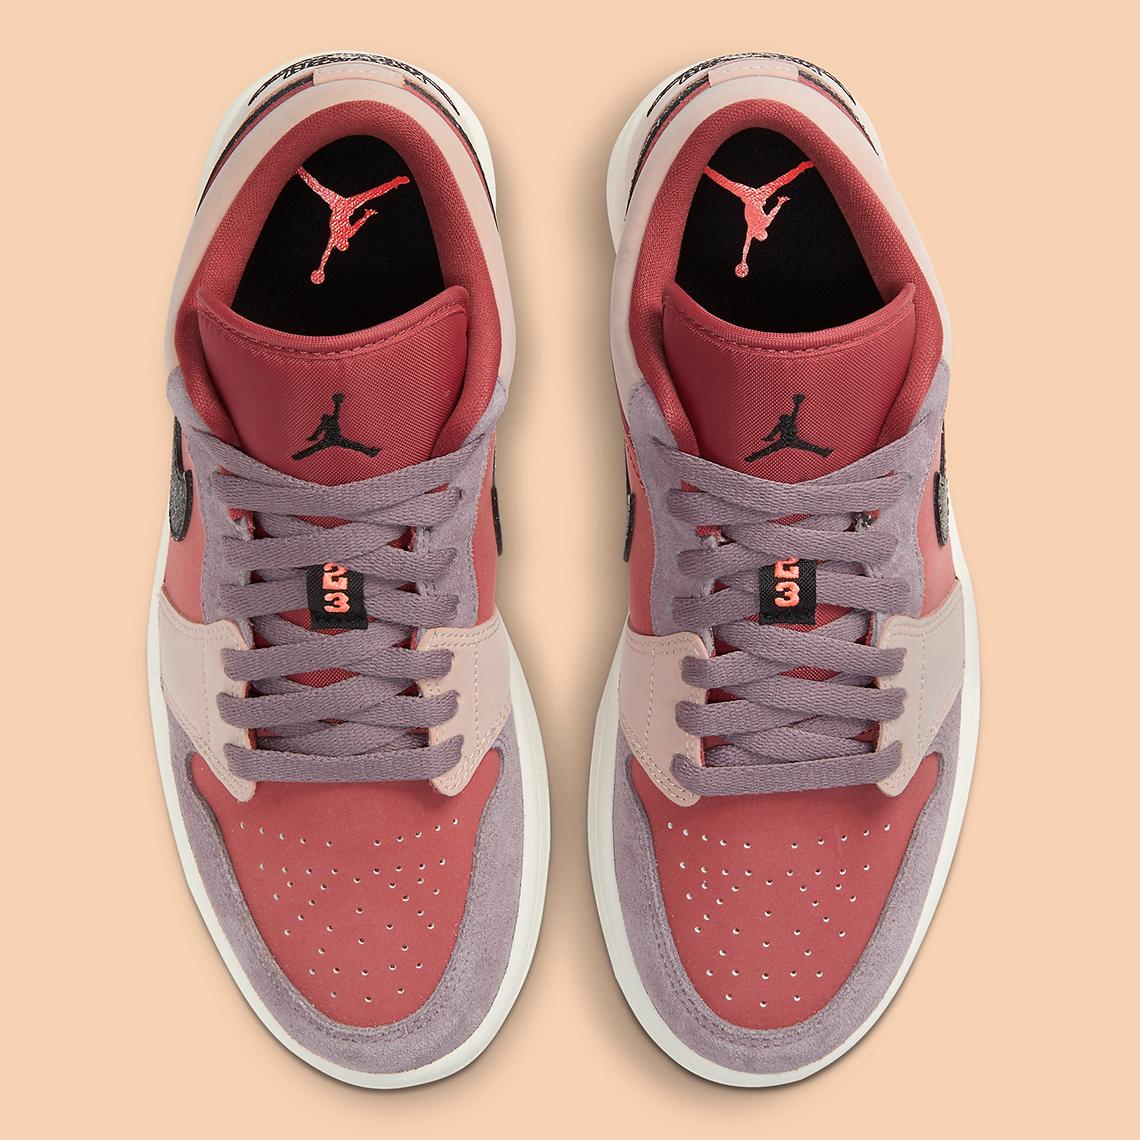 Air Jordan 1 Low Canyon Rust DC0774-602 Release Info | SneakerNews.com